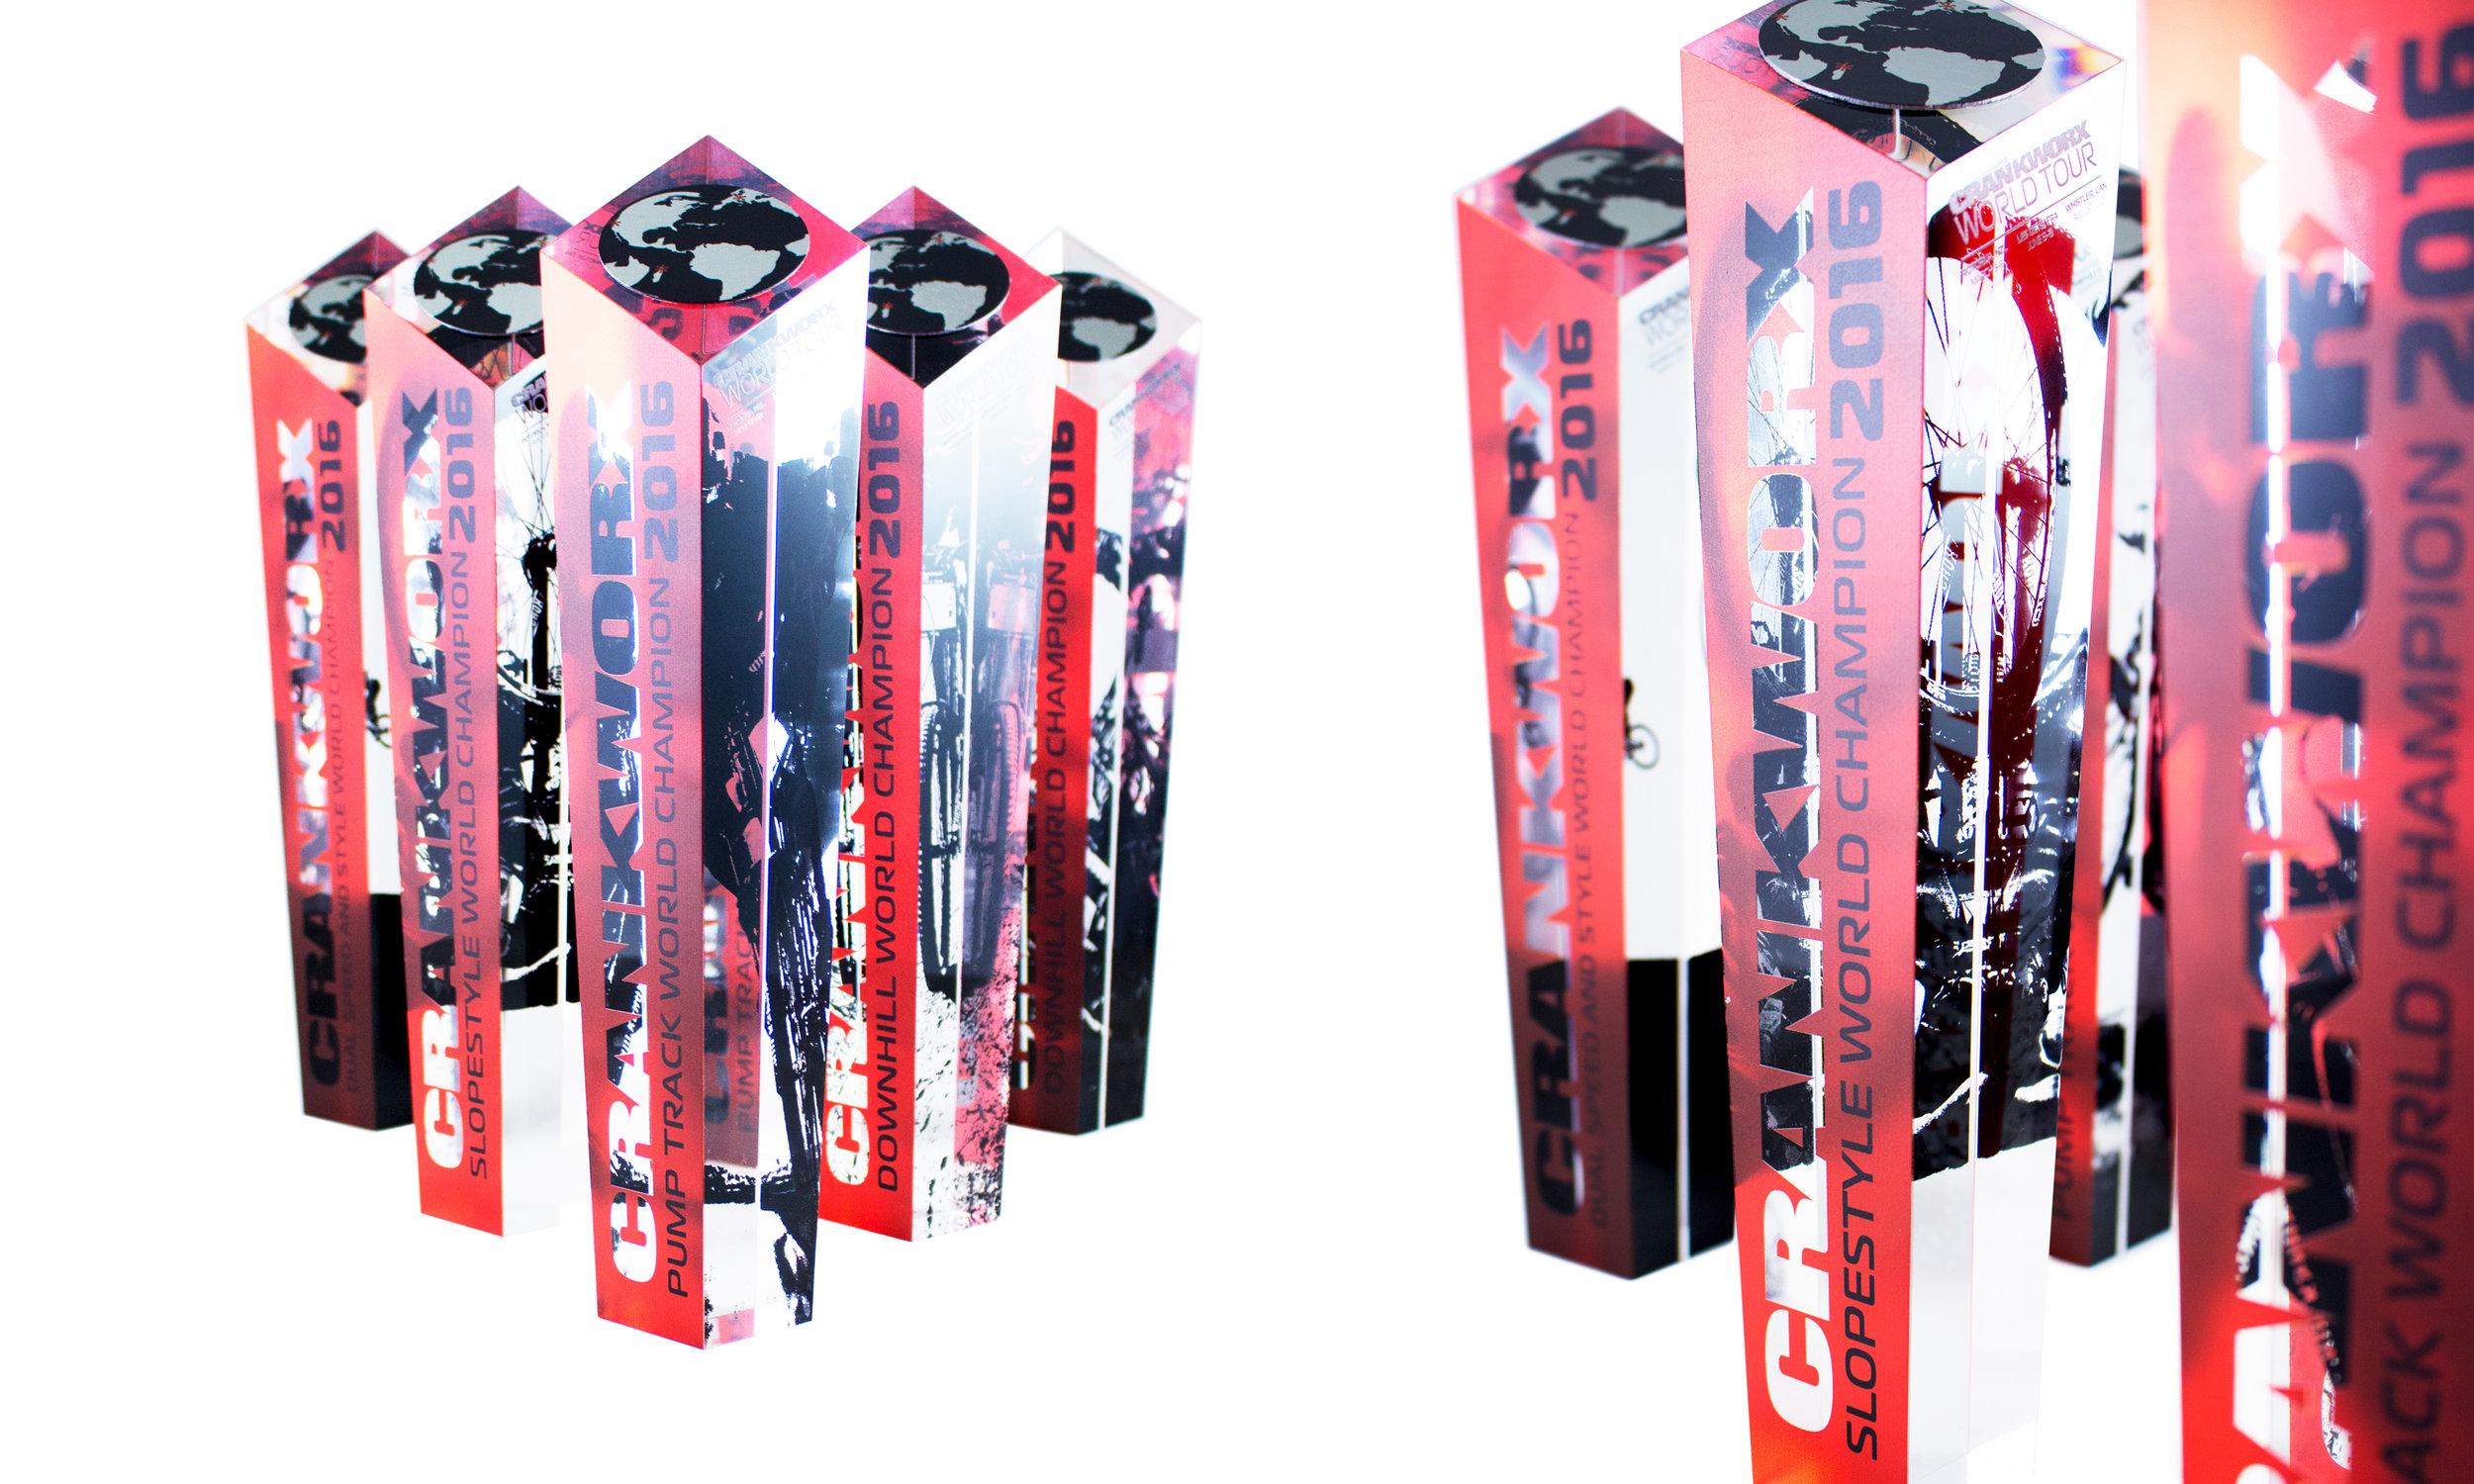 modern trophy design, sustainable awards, eco awards, sustainable trophies, eco trophies, environmentally friendly awards and trophies, modern trophy, modern trophies, custom trophies, custom trophy